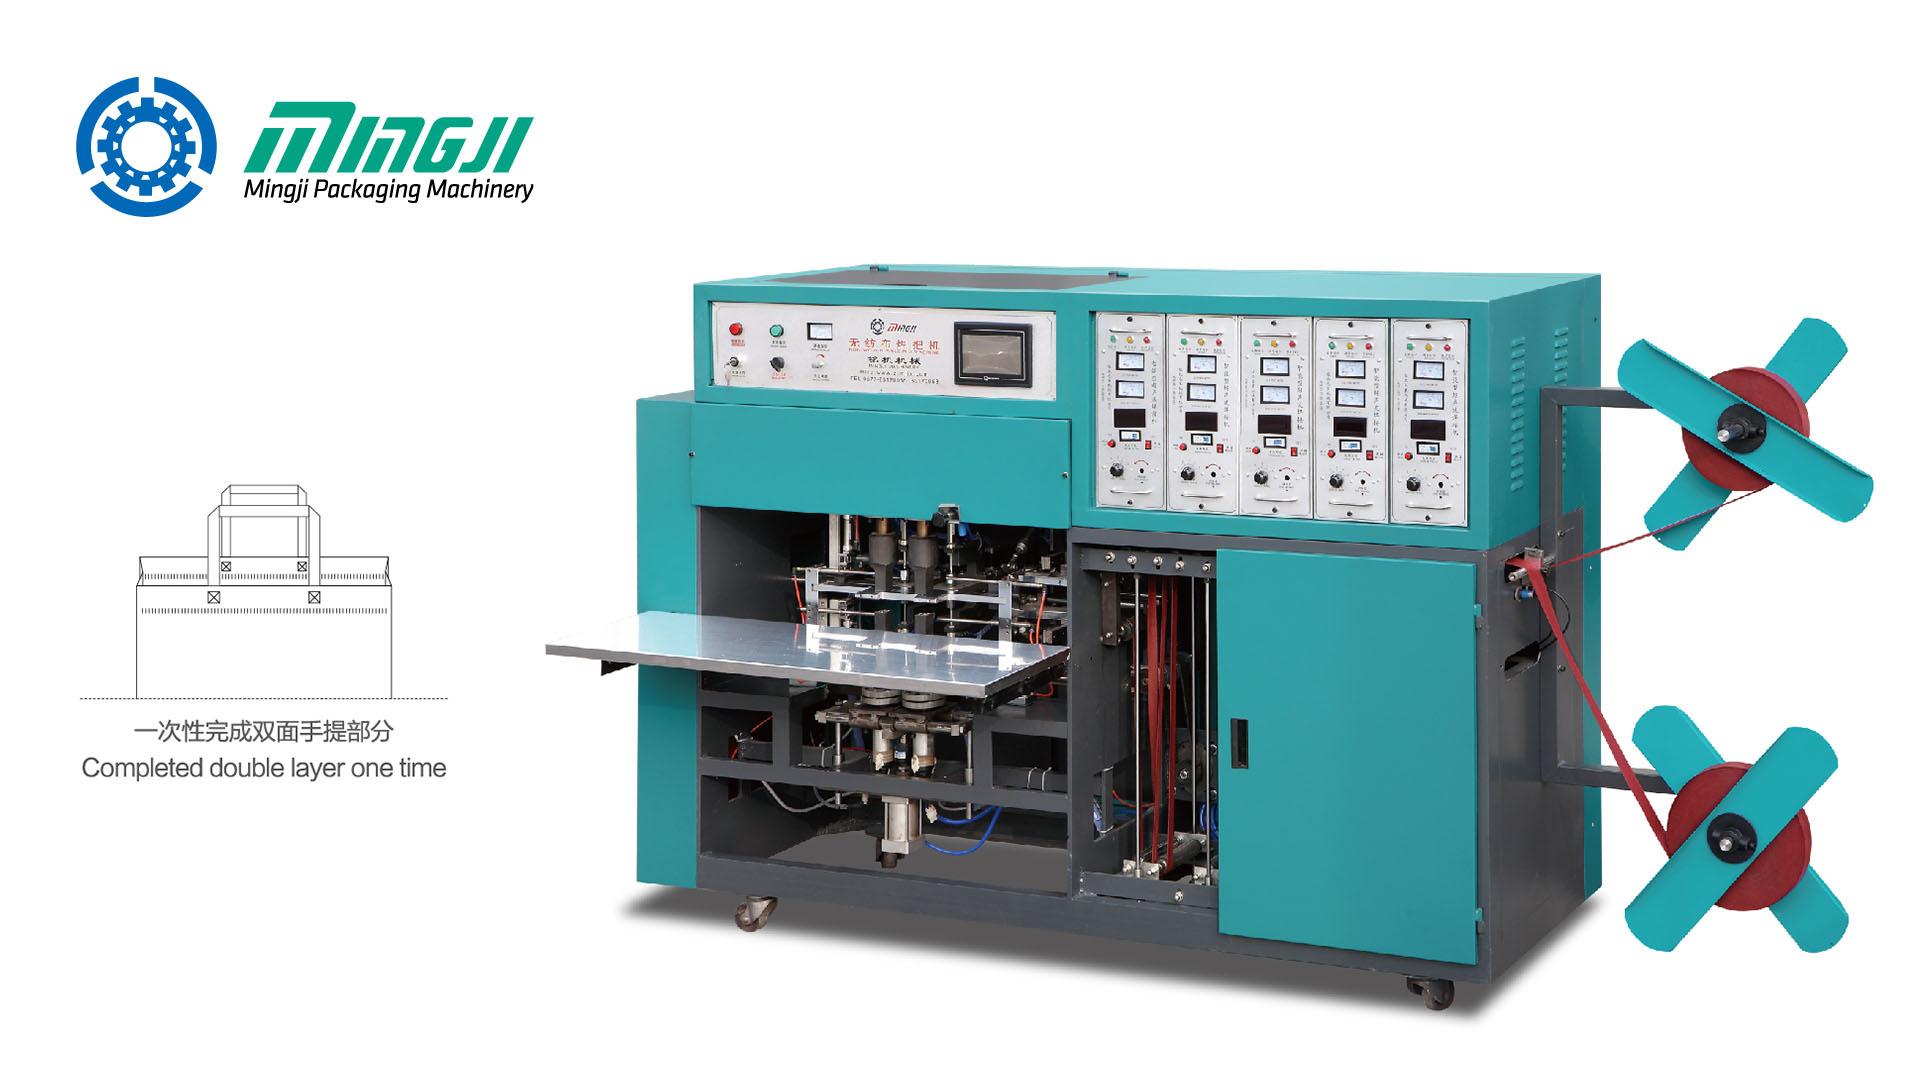 MJWM600-800A - Otomatik Dokuma Kulp Yapıştırma Makinesi